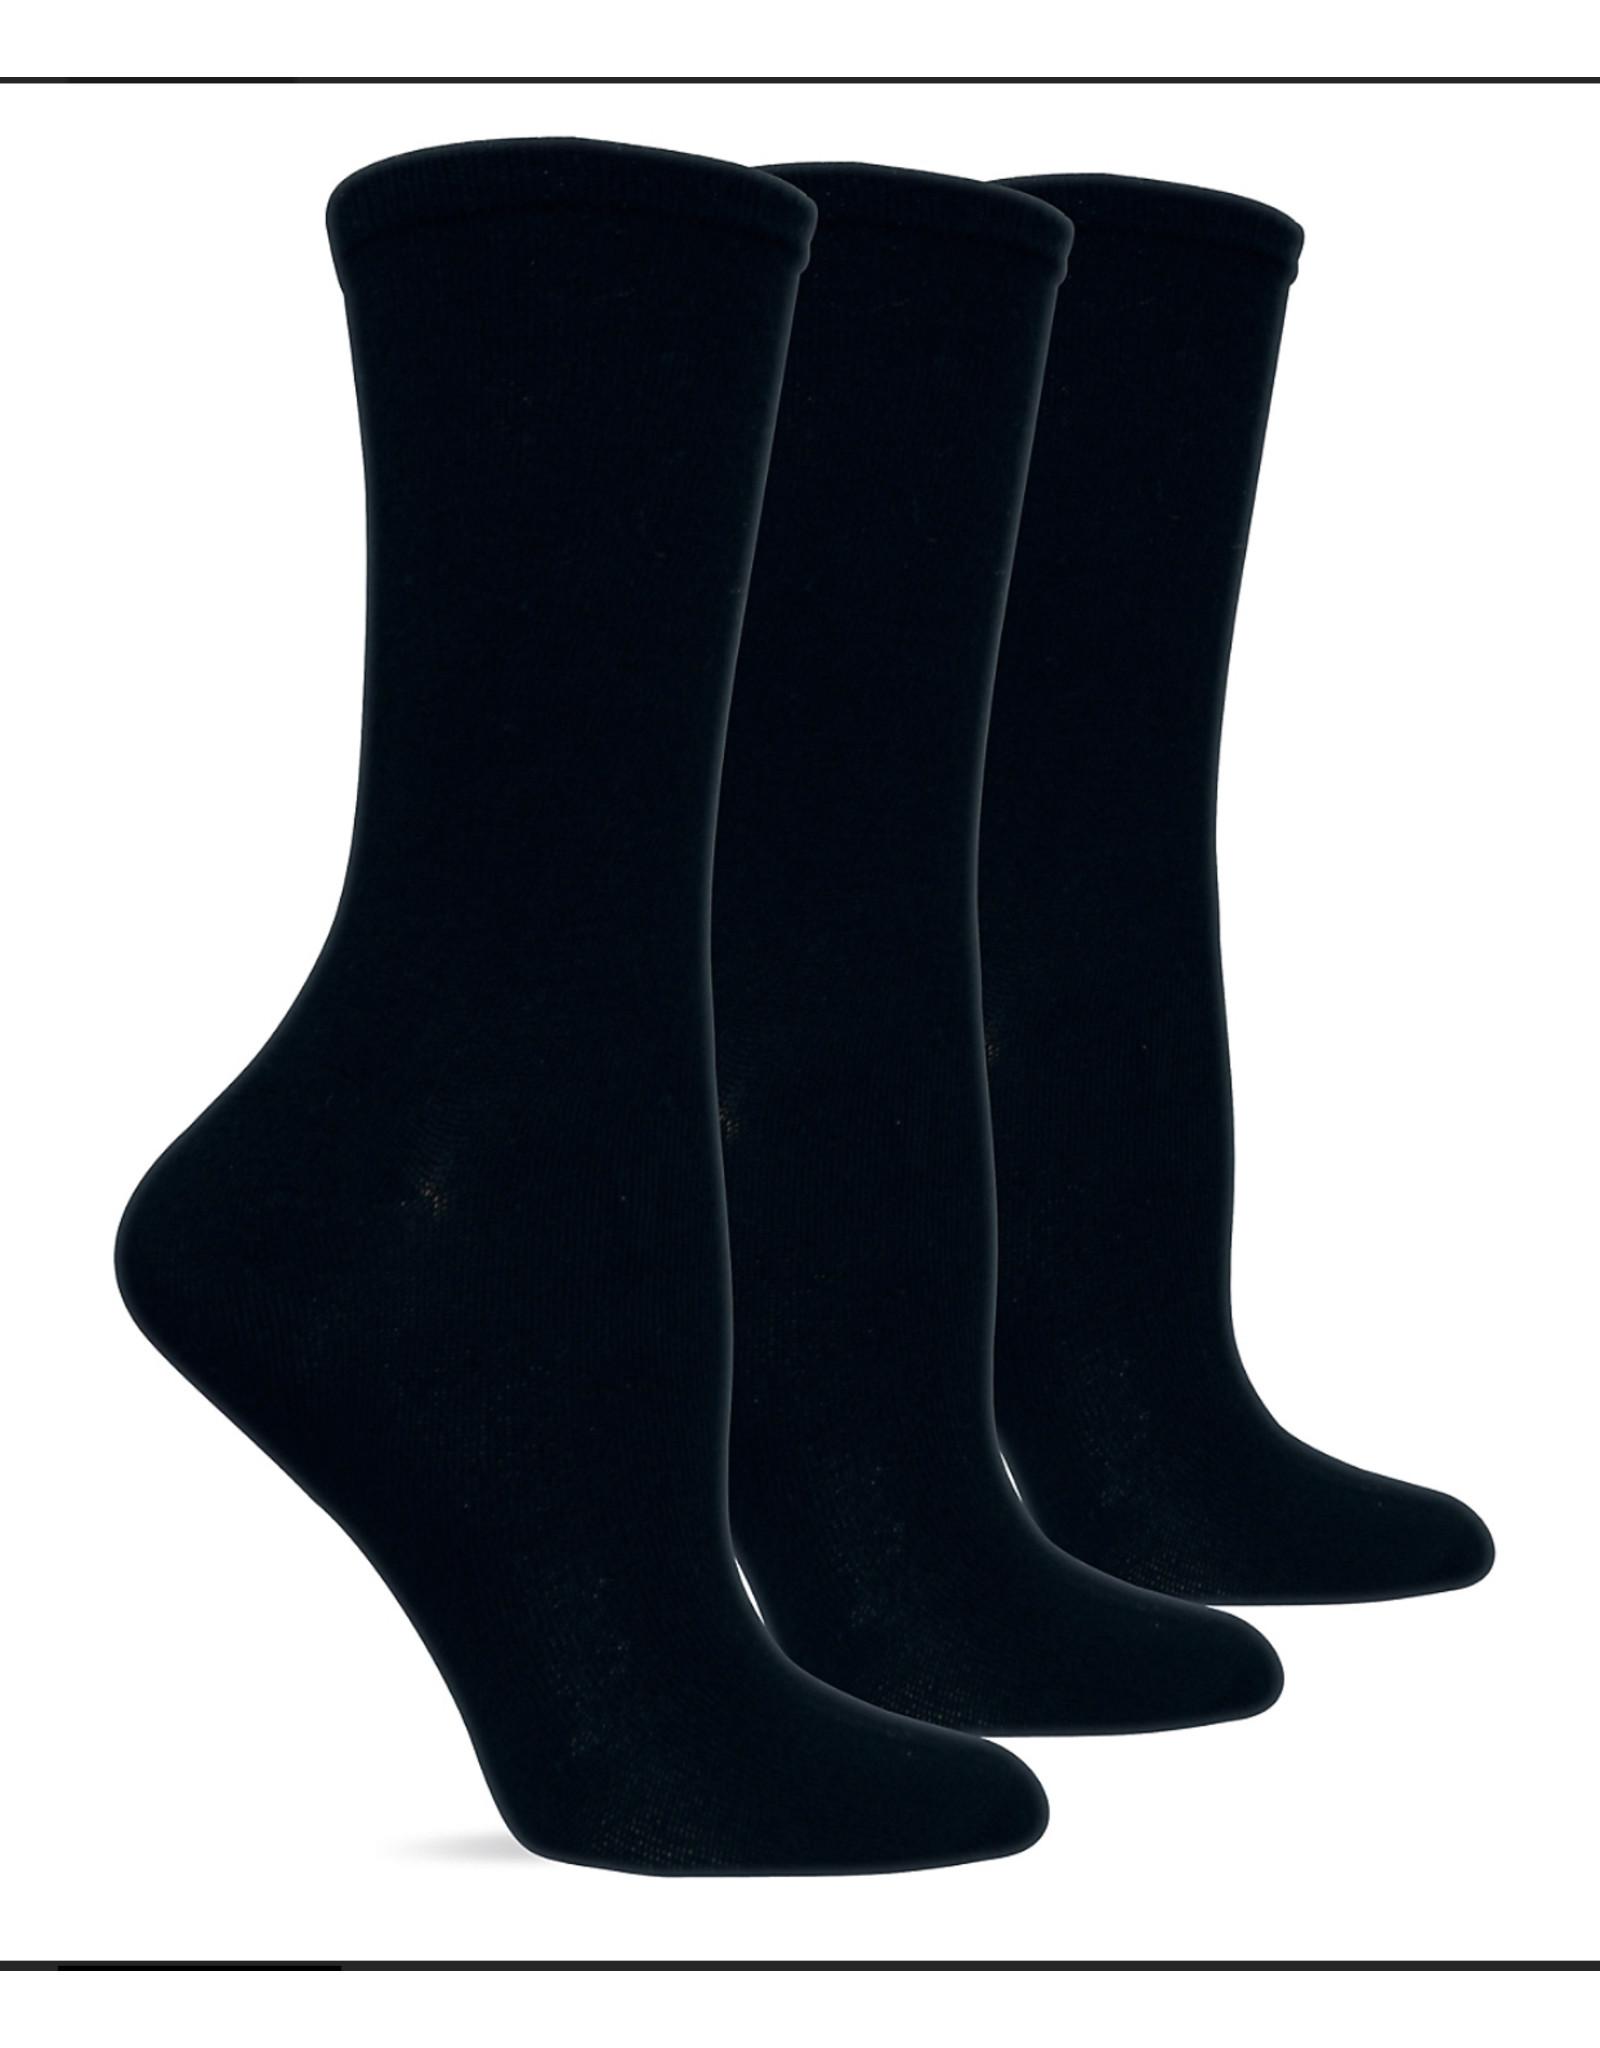 Hotsox Hot Sox Solid Crew Socks 3-Pack HO000088PK